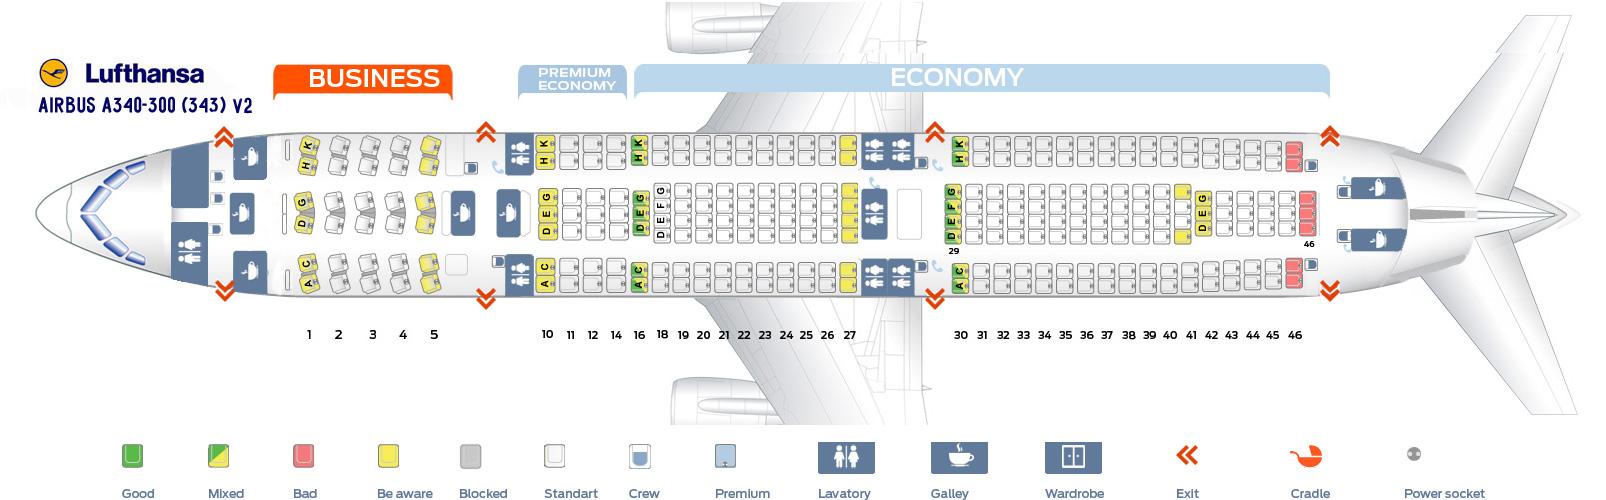 Seat_map_Lufthansa_Airbus_A340-300_v2